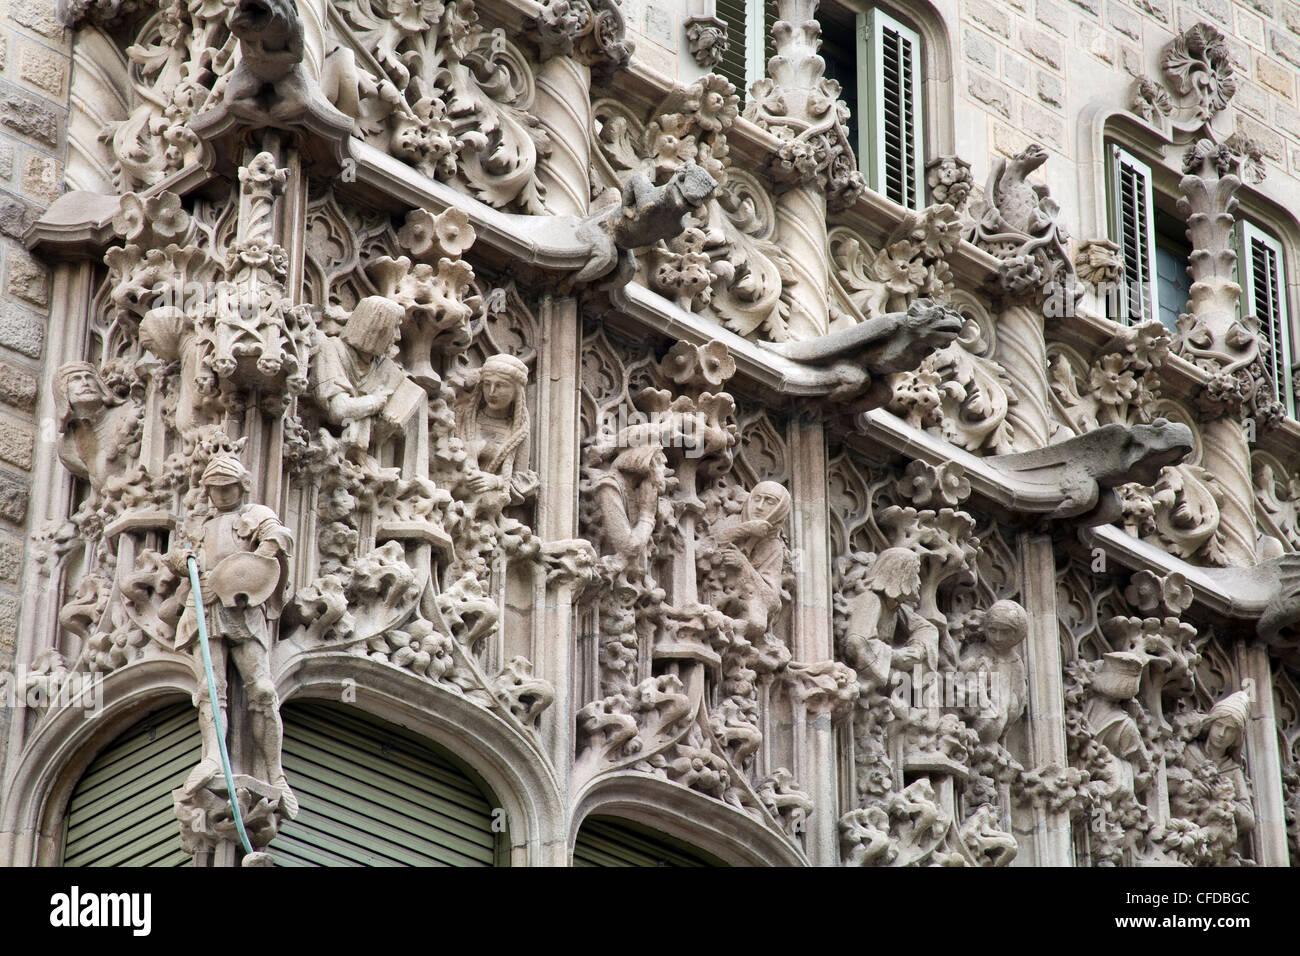 Palau del Baro Quadras by Josep Puig Cadafalch, Barcelona, Catalonia, Spain, Europe - Stock Image